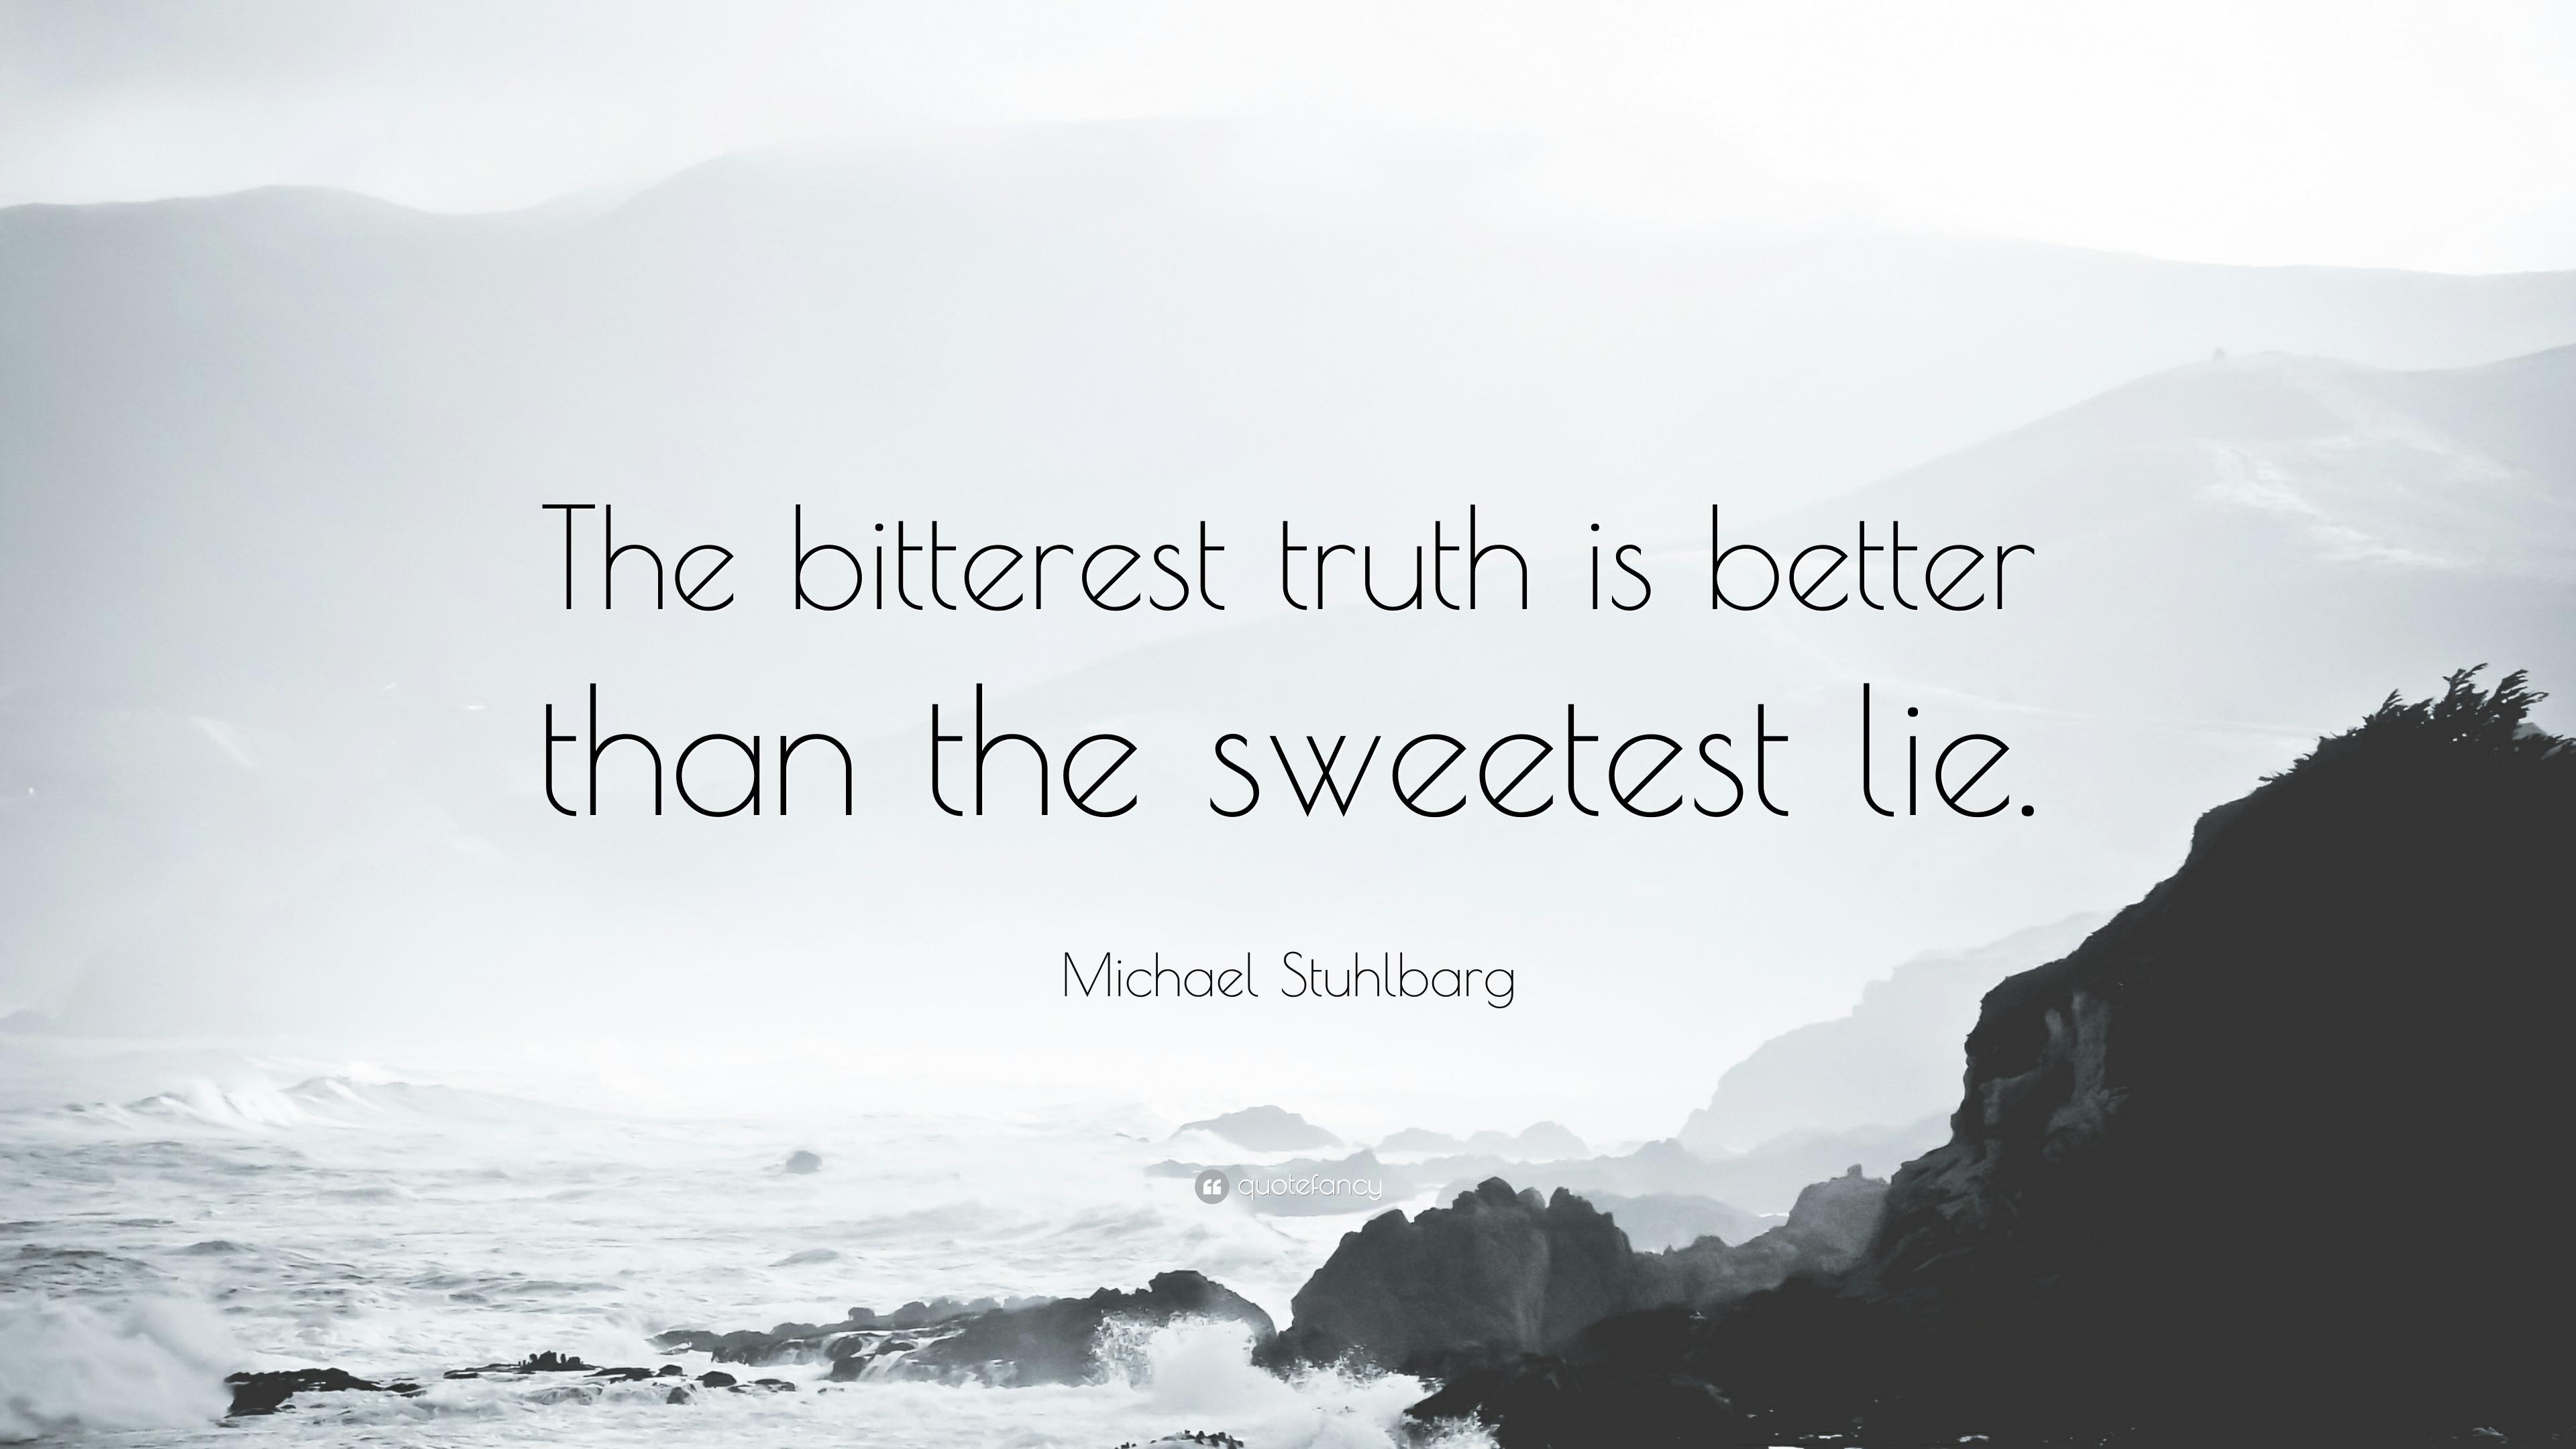 Michael Stuhlbarg Quote: The bitterest truth is better